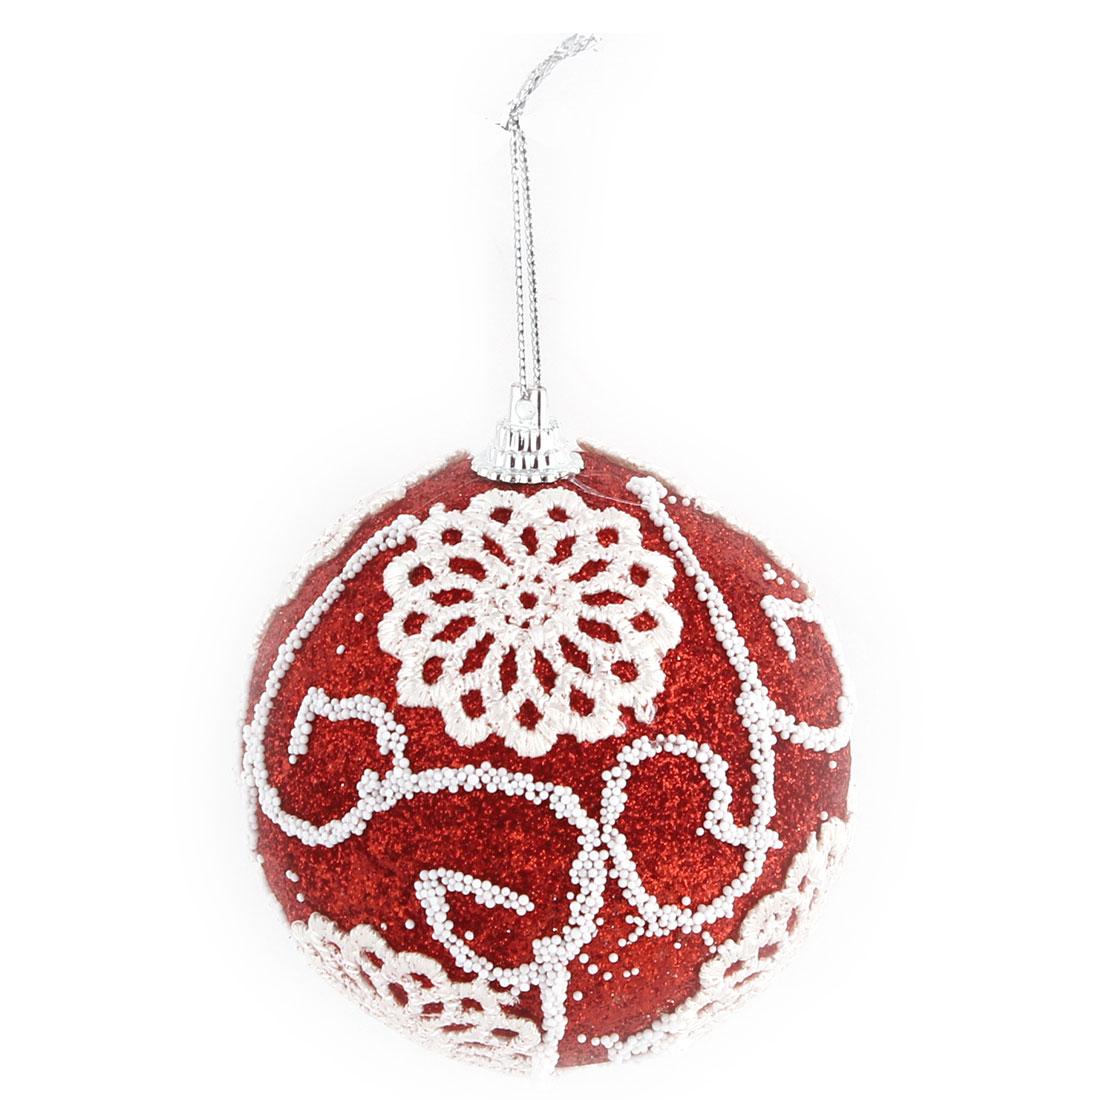 Unique Bargains Christmas Party Appliques Decor Artificial Collectible Festive Hanging Ball